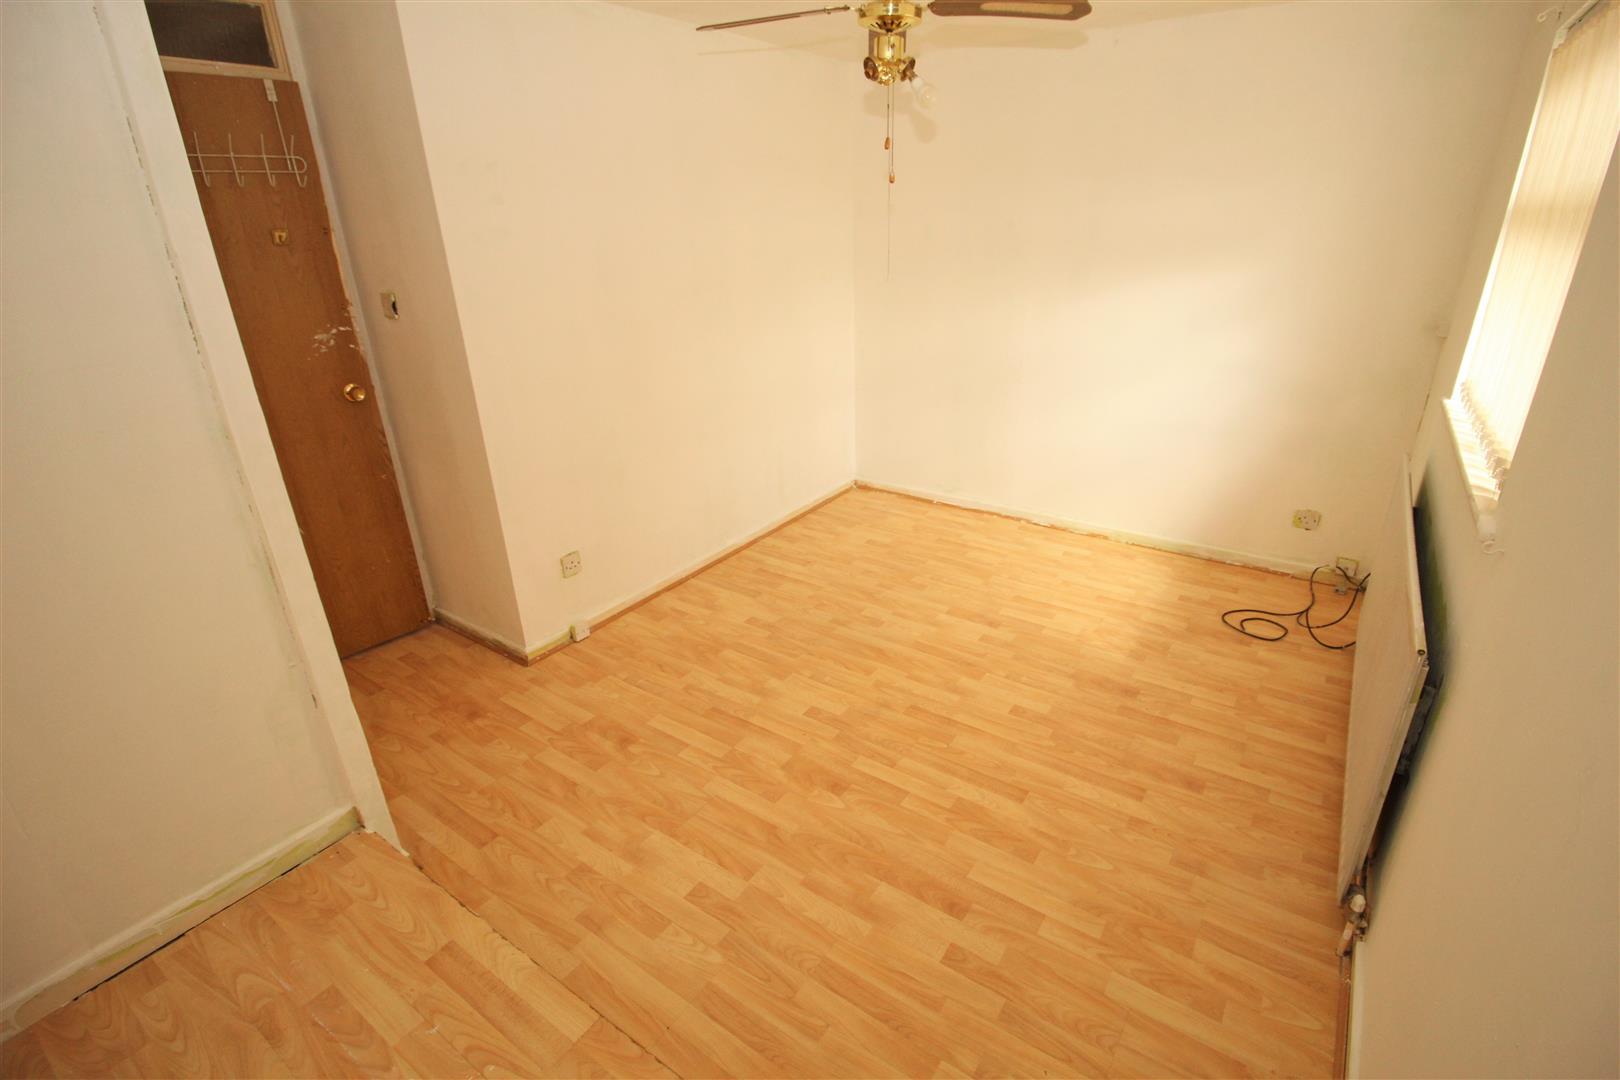 3 Bedrooms, House - Semi-Detached, Peterlee Way, Bootle